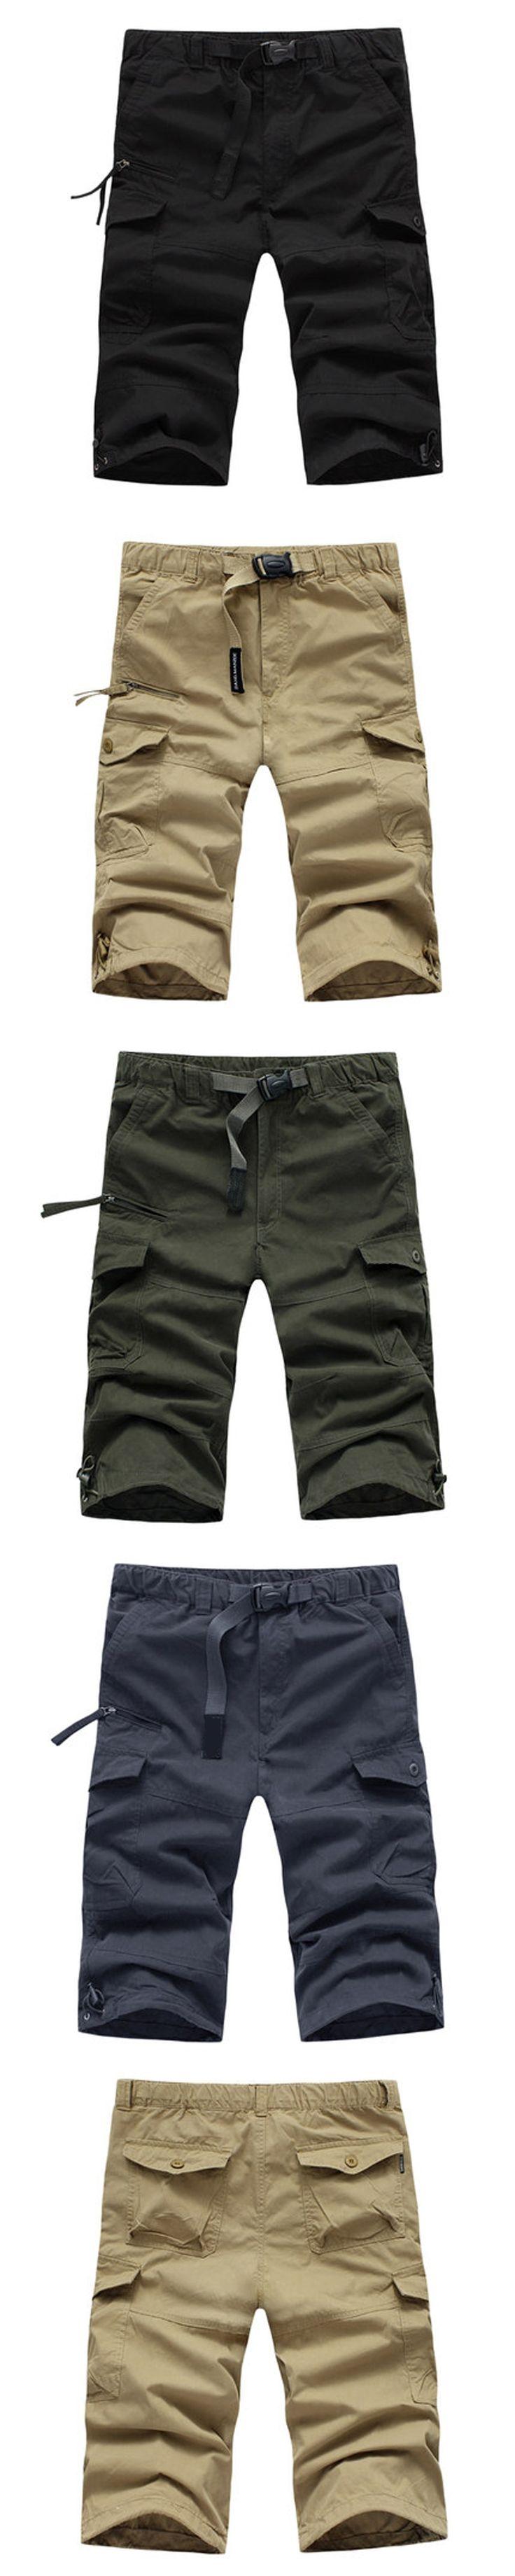 Baggy Size M-3XL Blue Green Multi-pocket Hip pop Black Military Army Combat Khaki Men's Cargo Shorts Cotton